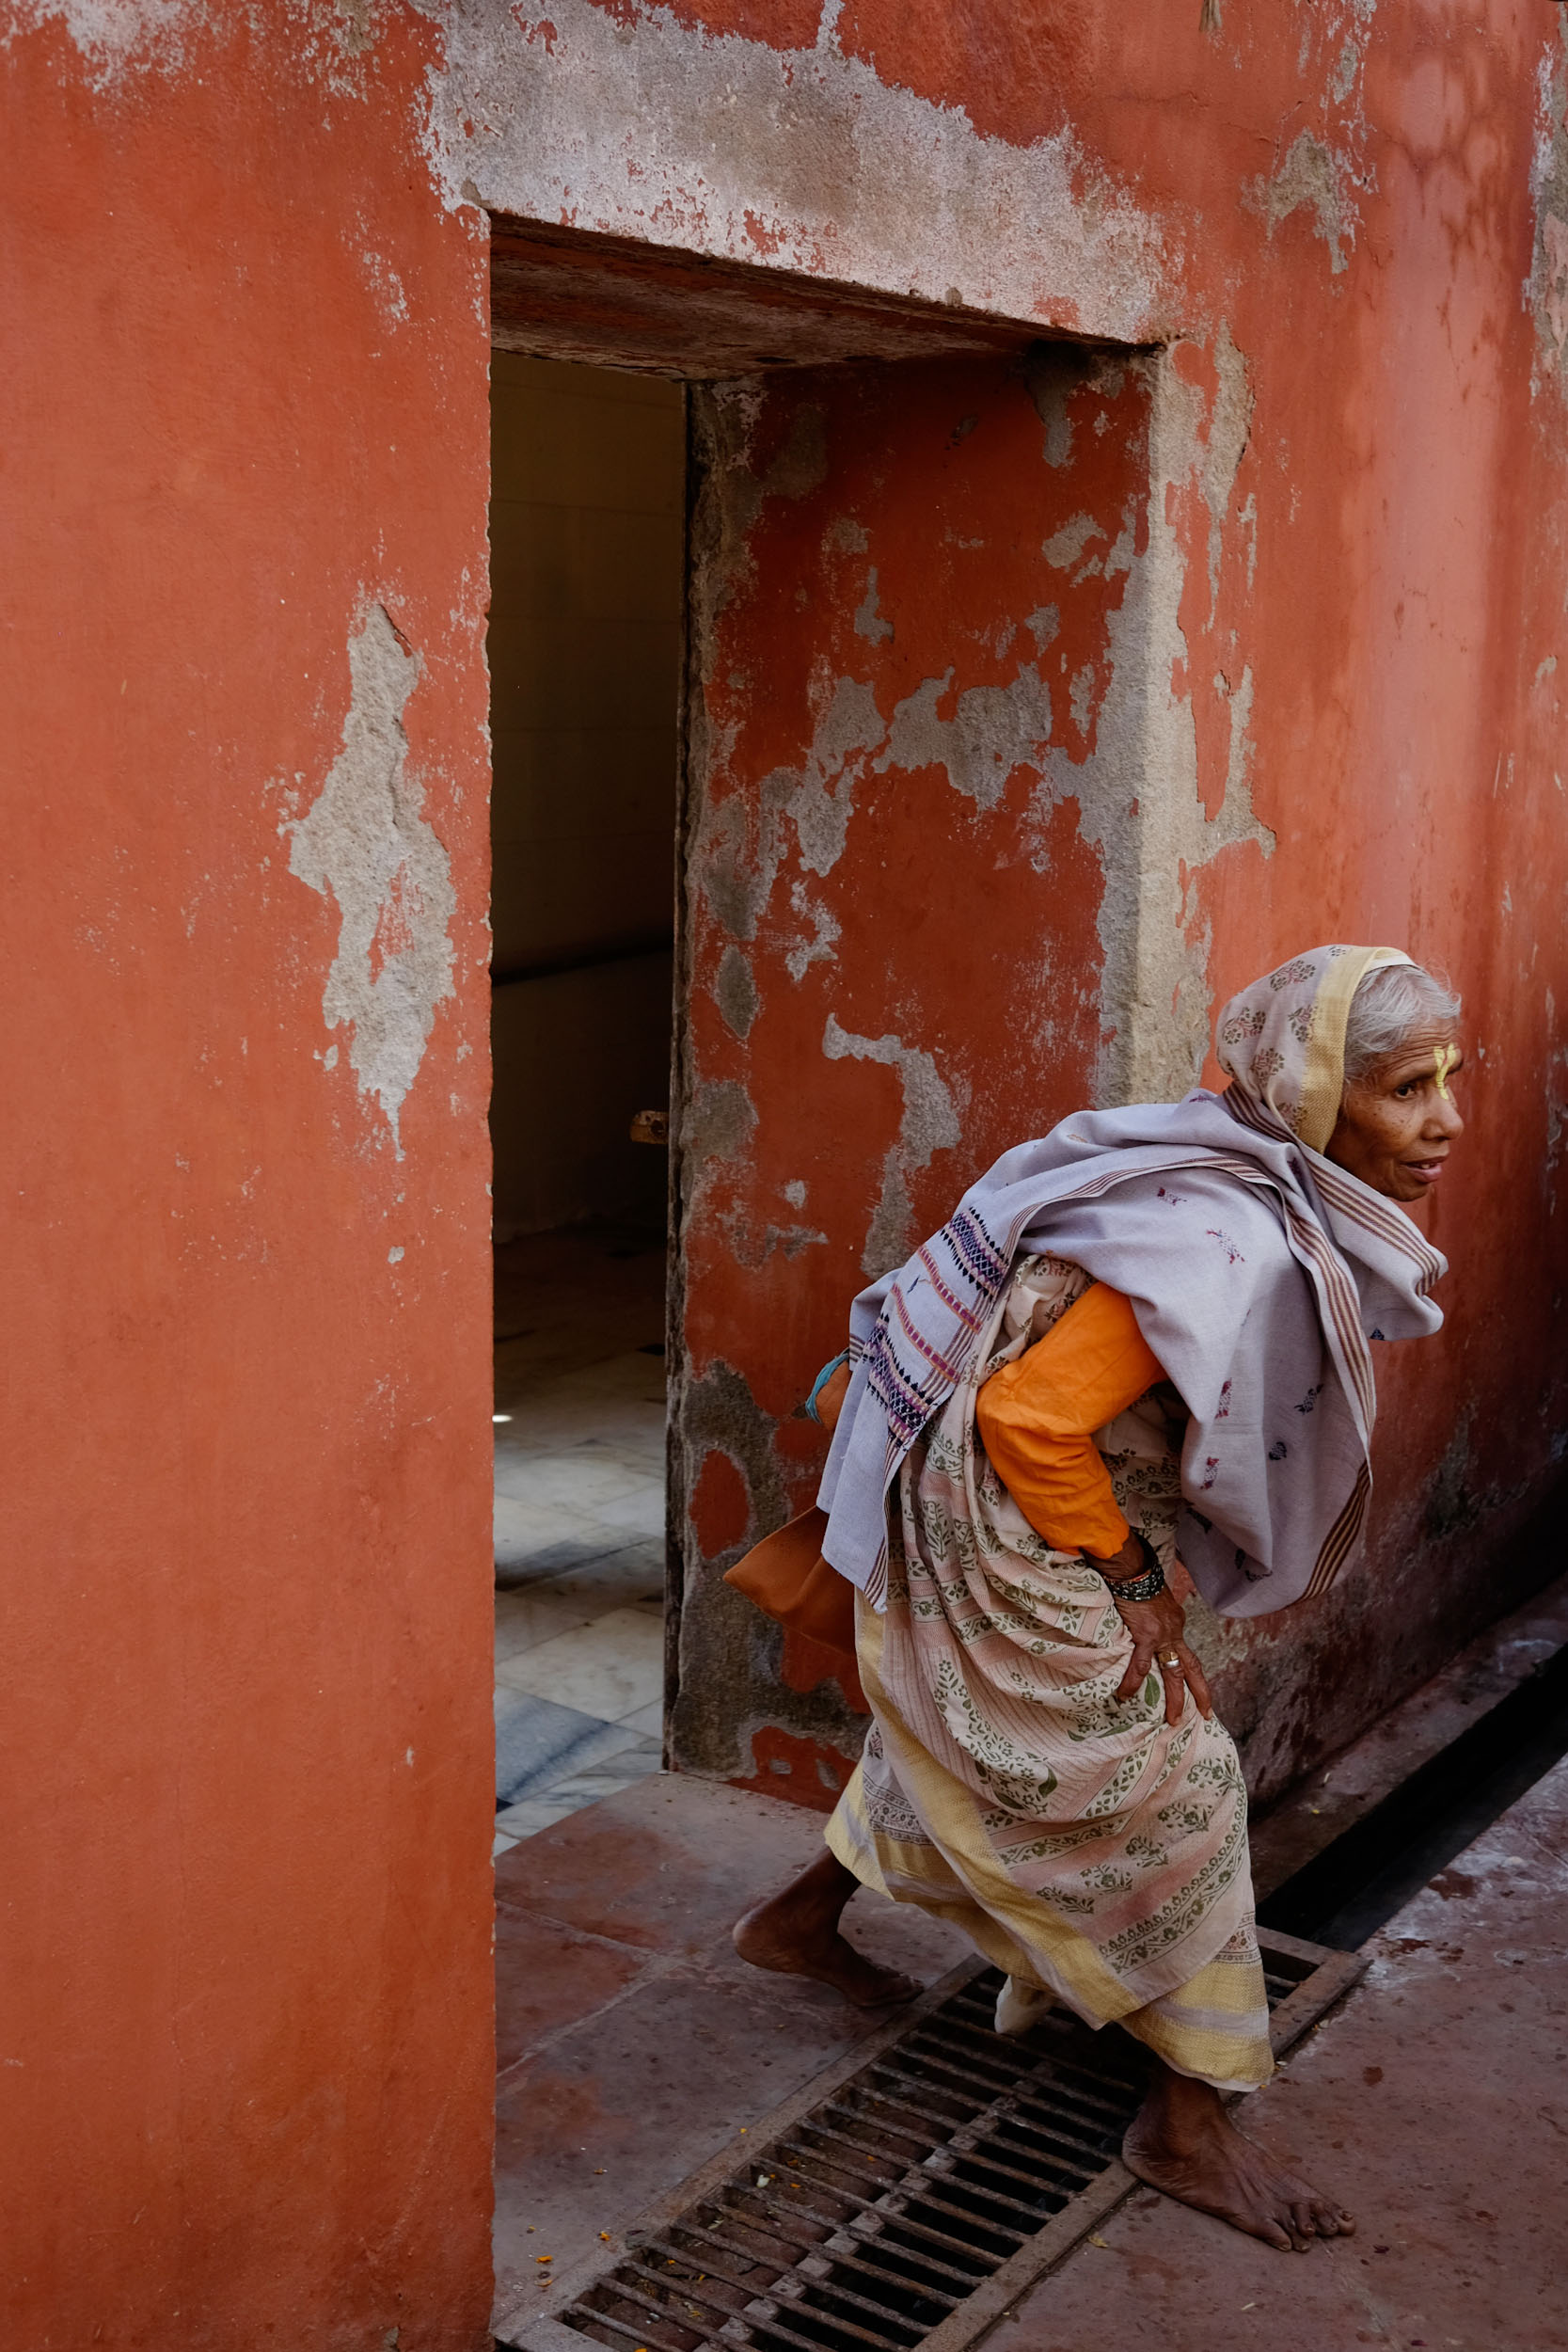 Sindhur_Photography_Travel_People_Holi-15.JPG